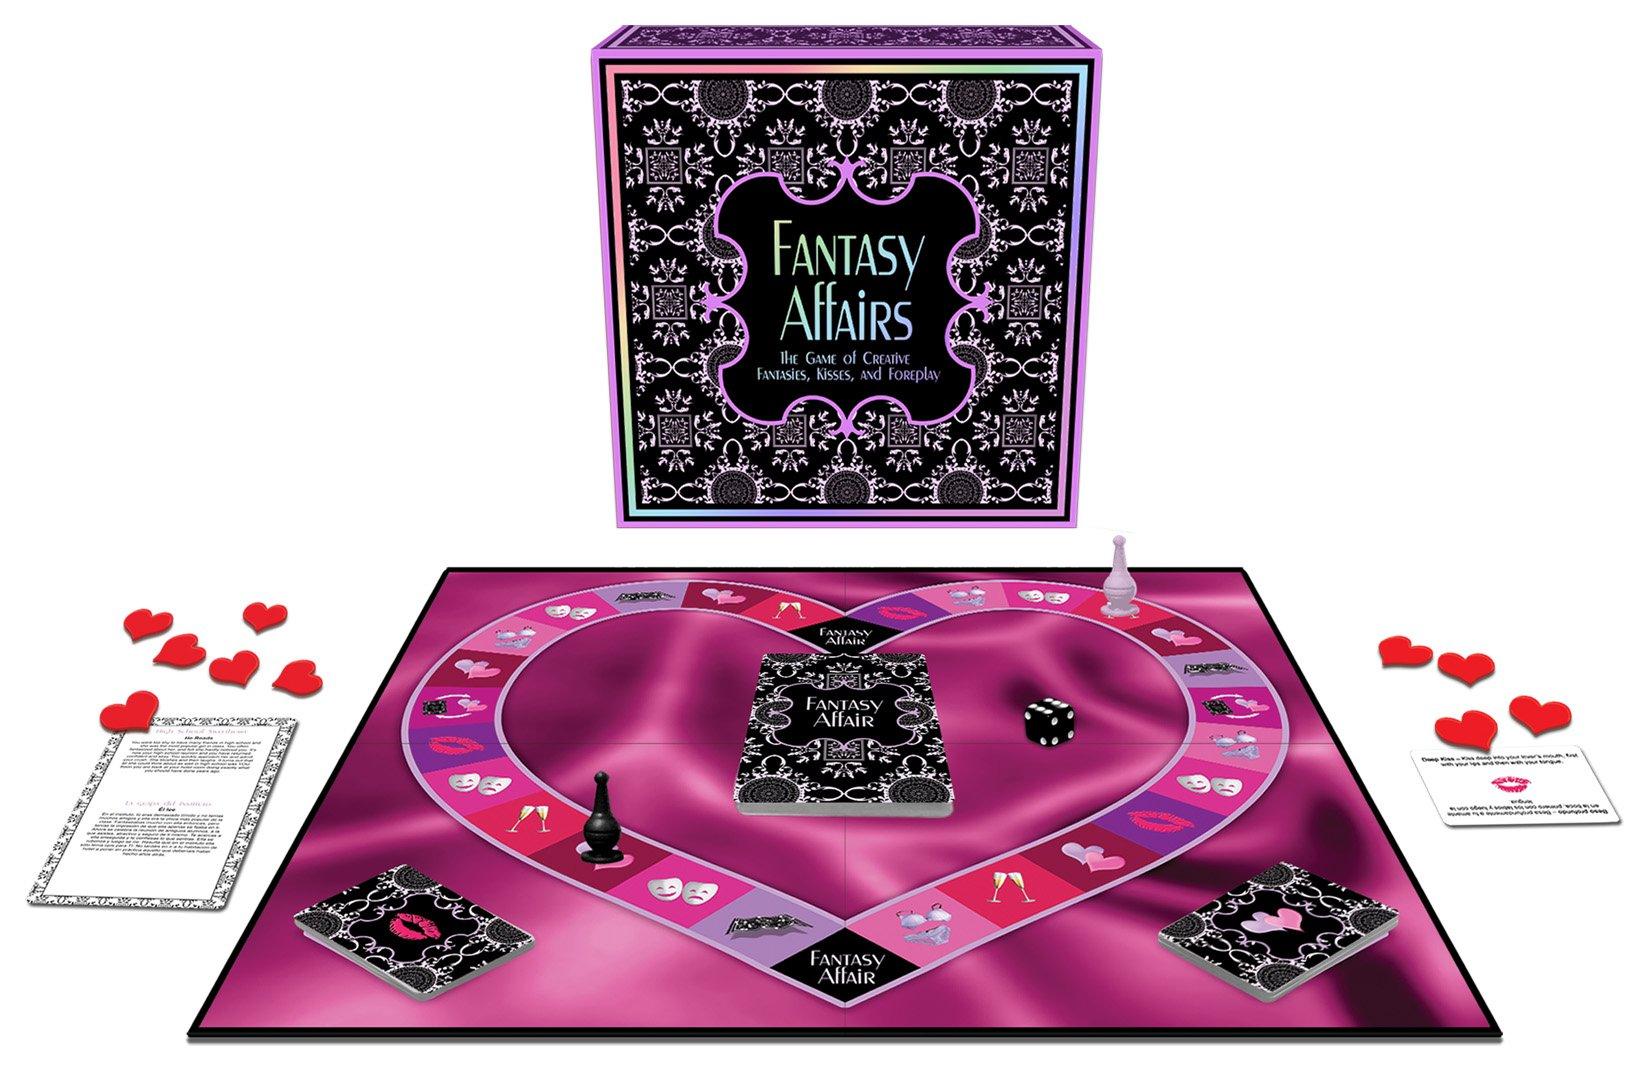 Games erotic board games